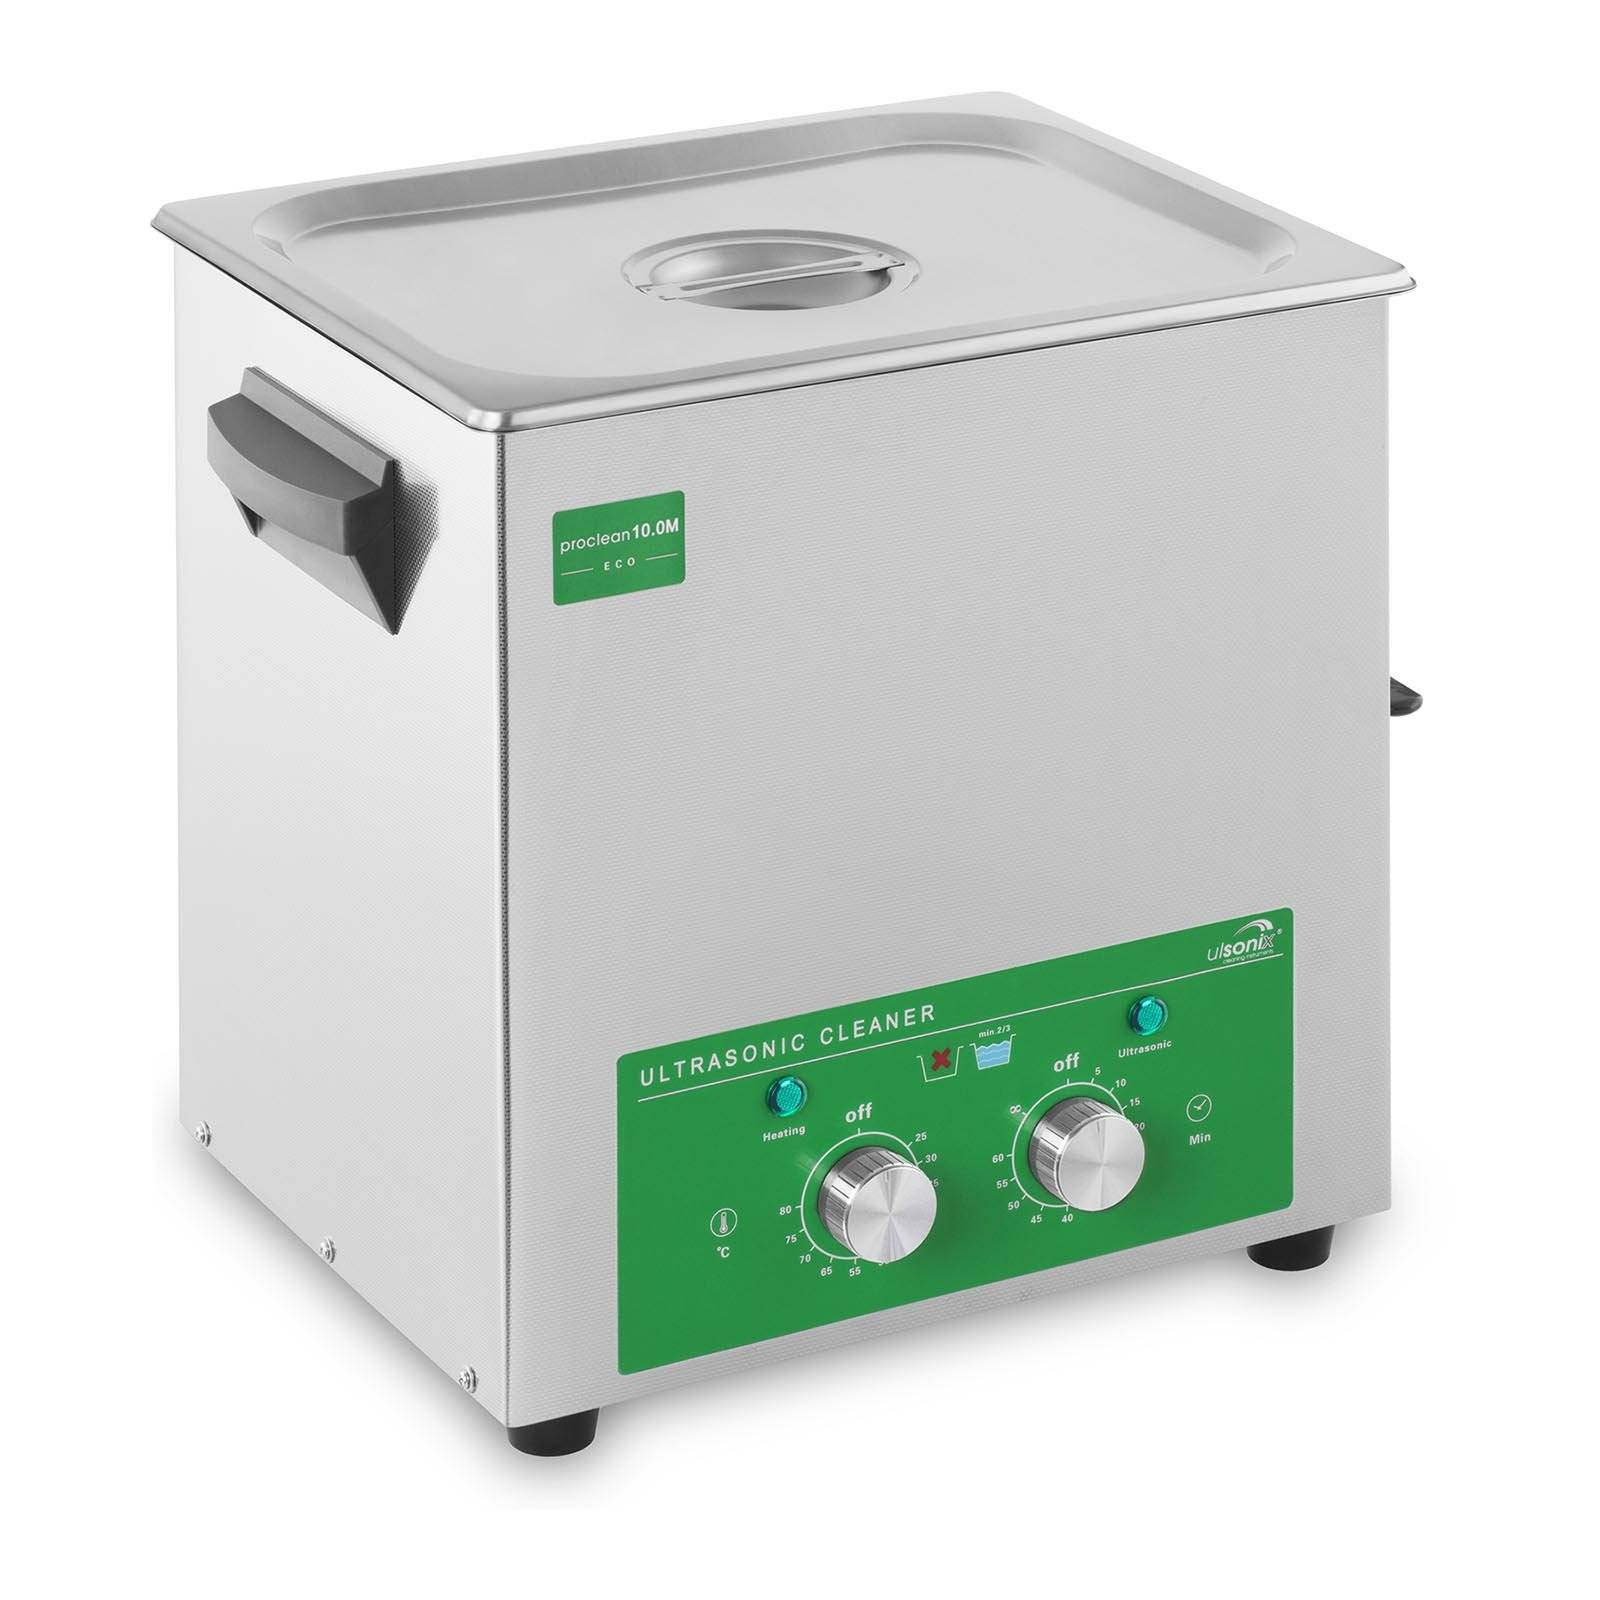 ulsonix Nettoyeur ultrason - 10 litres - 180 W - Eco PROCLEAN 10.0M ECO